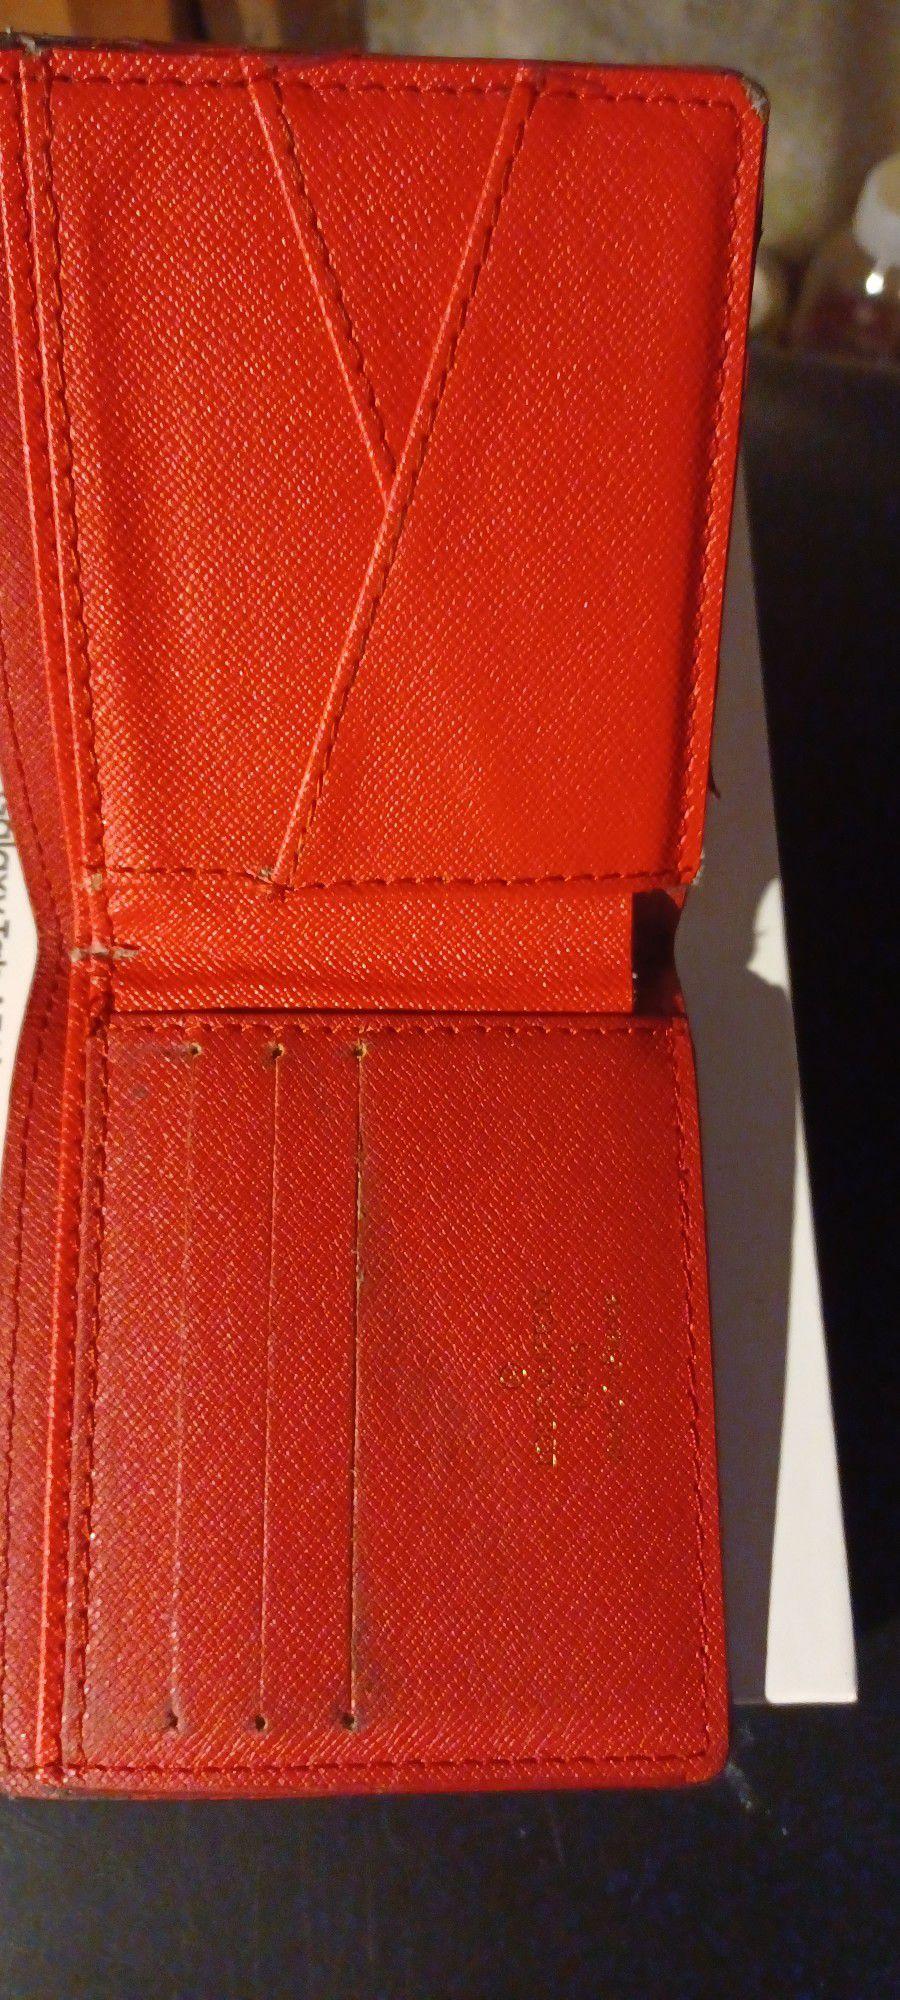 Louis Vuitton Supreme Epi Slender Wallet